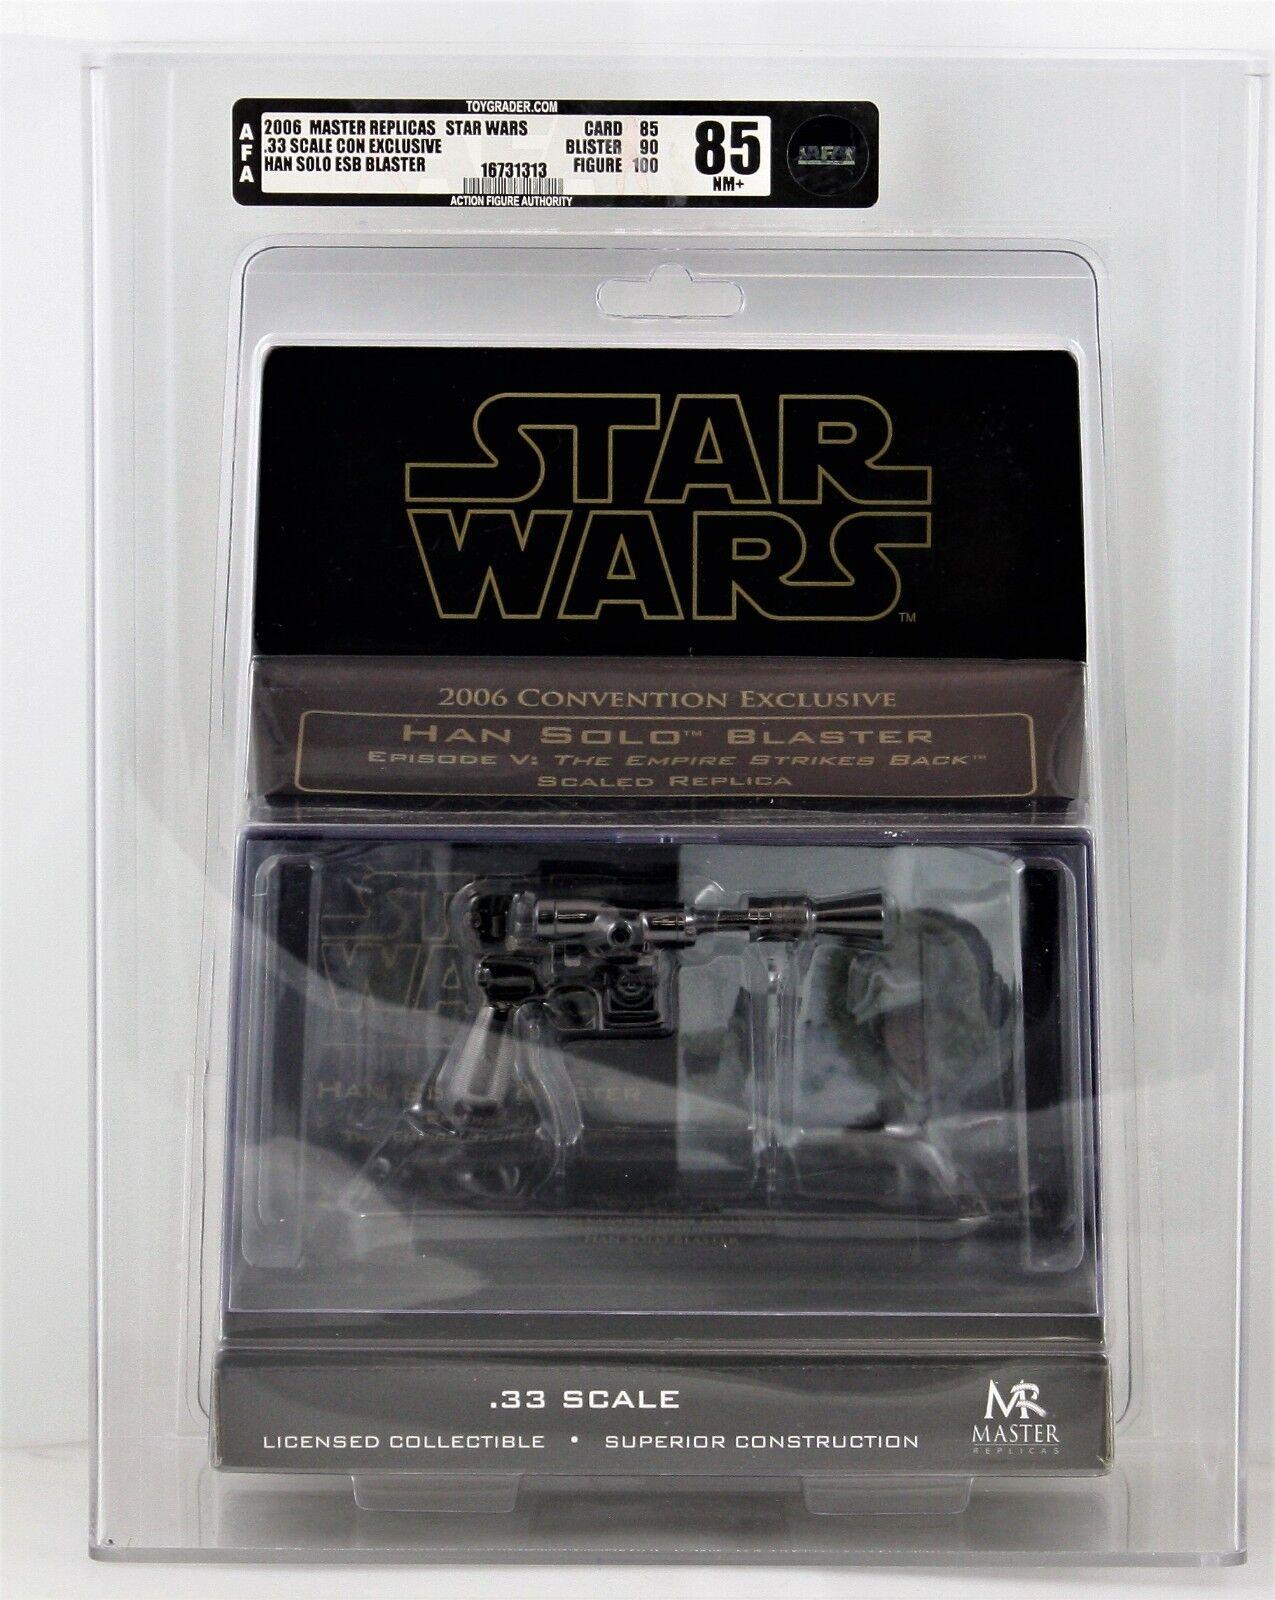 AFA 8.5 Star Wars Han Solo EP5 edition blaster mini scale 2006 SDCC